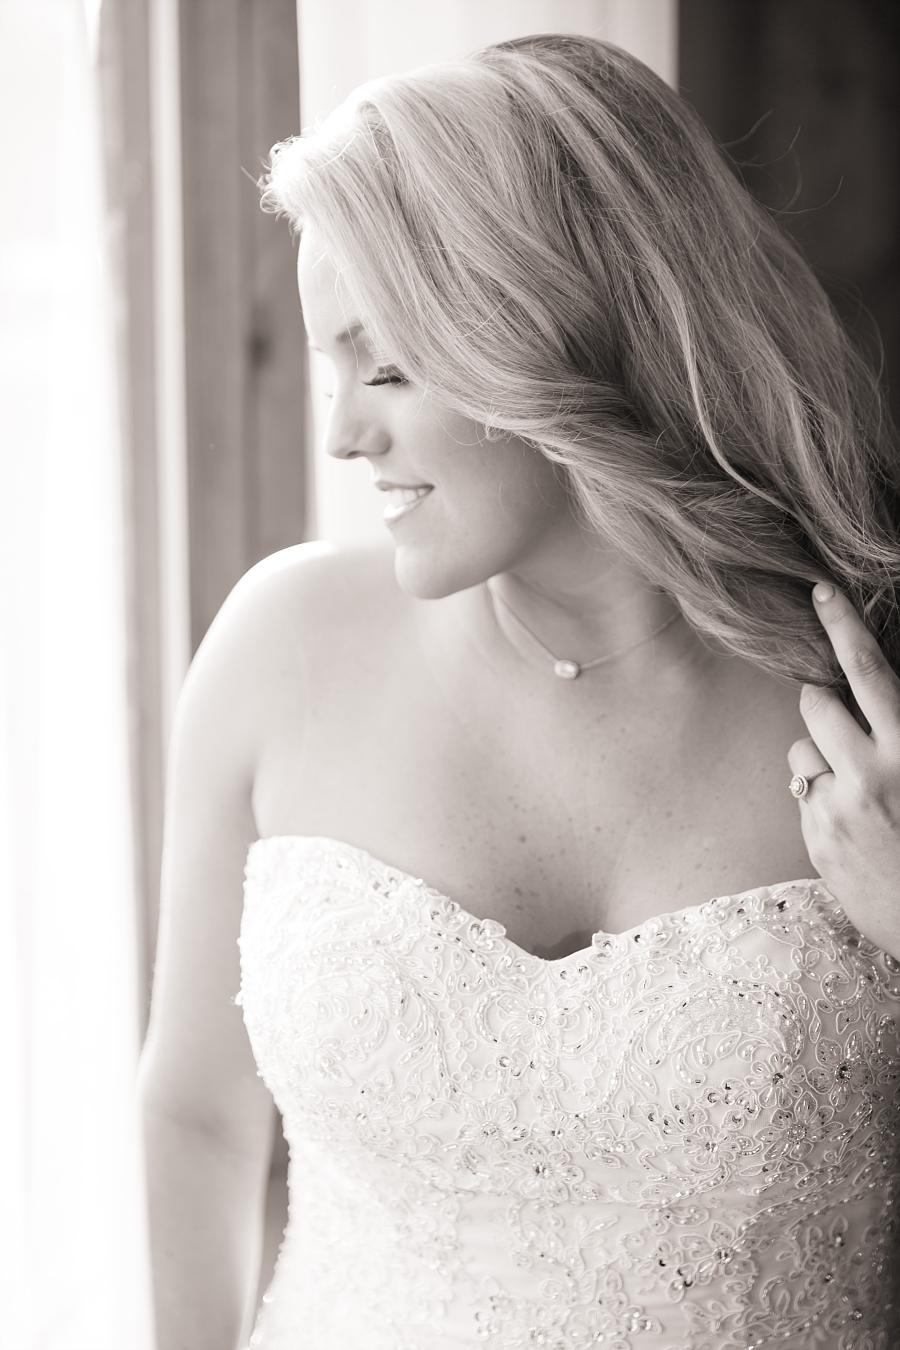 Stacy-Anderson-Photography-Balmorhea-Tomball-Wedding-Photographer_0003.jpg